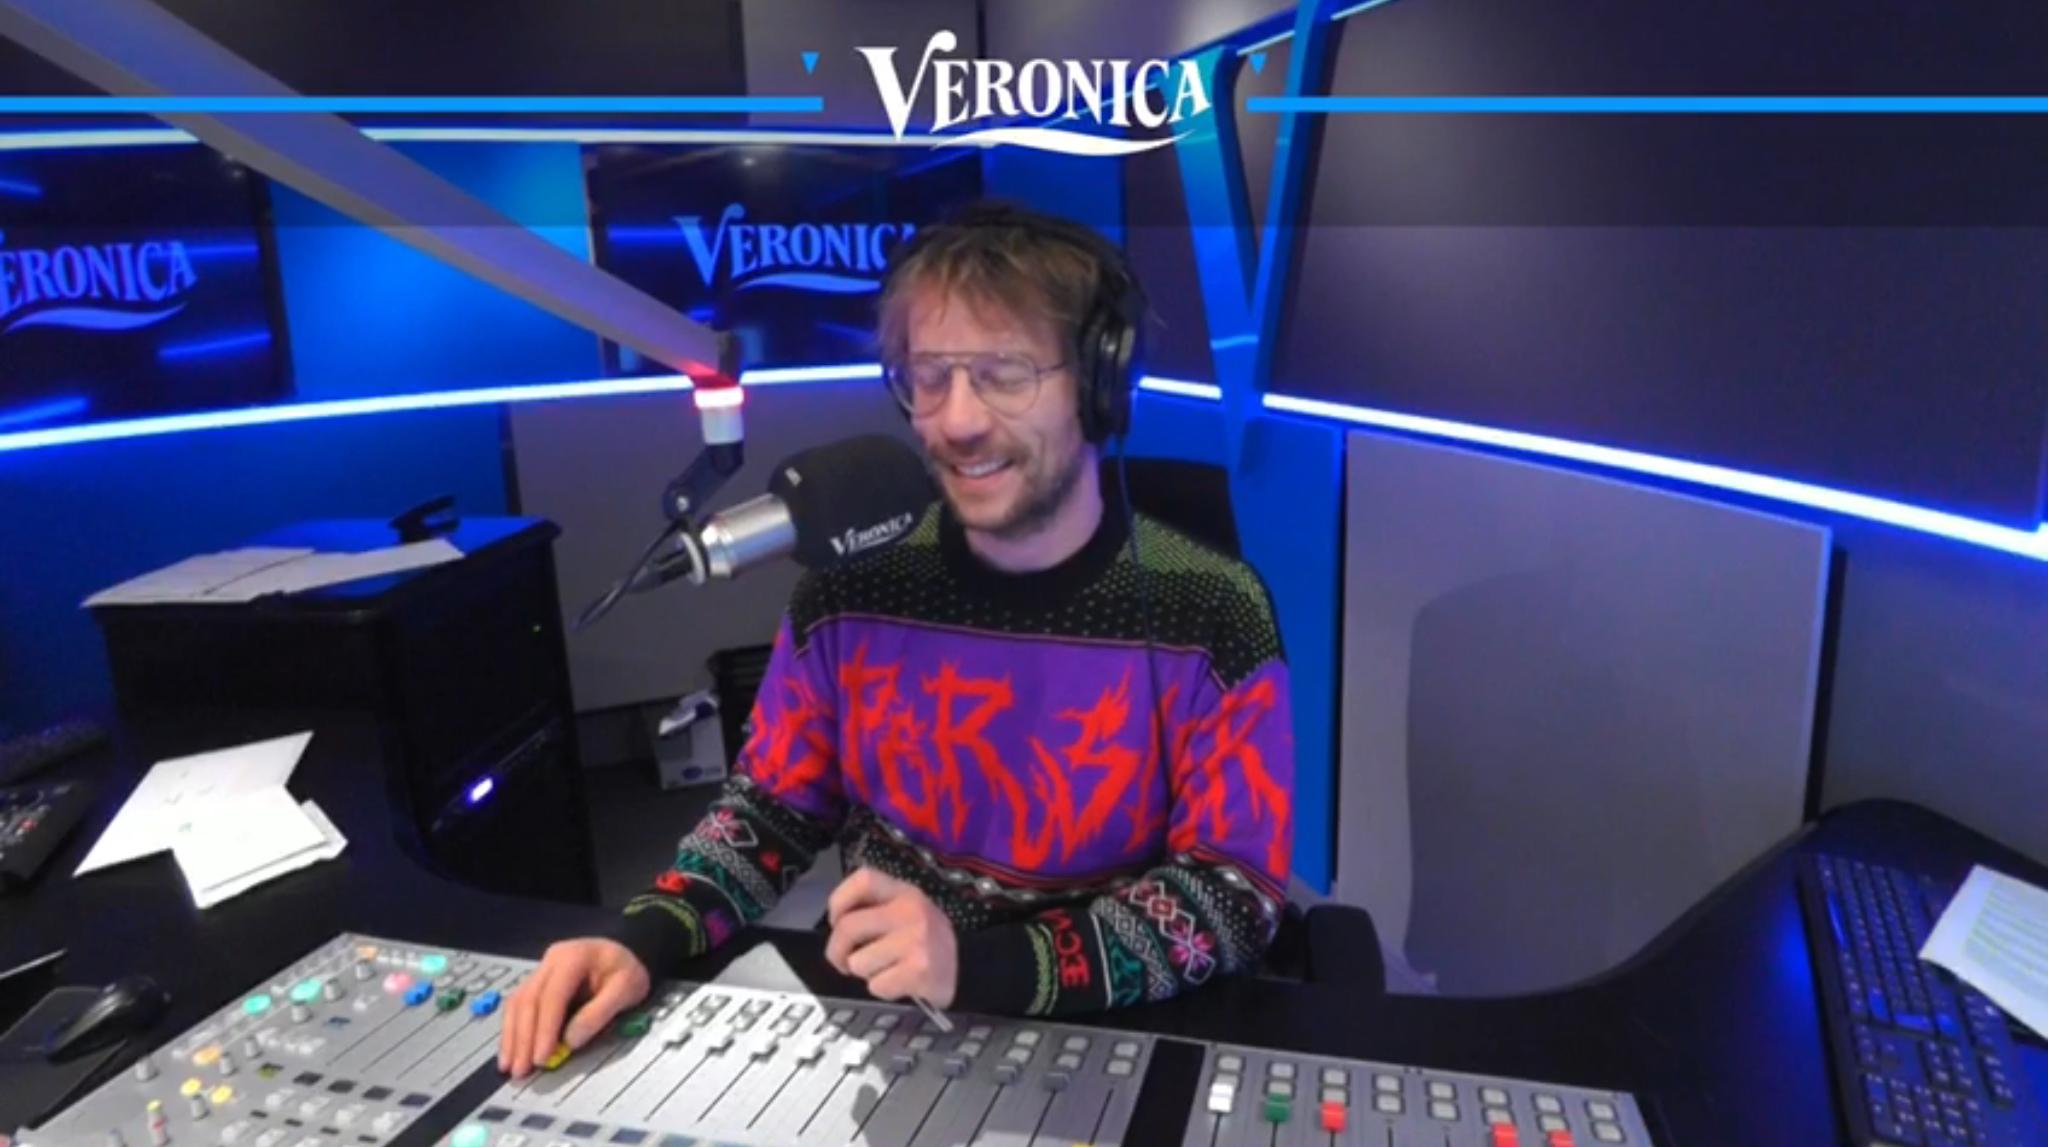 Giel van Beelen Radio Veronica Blackstone international bootsday